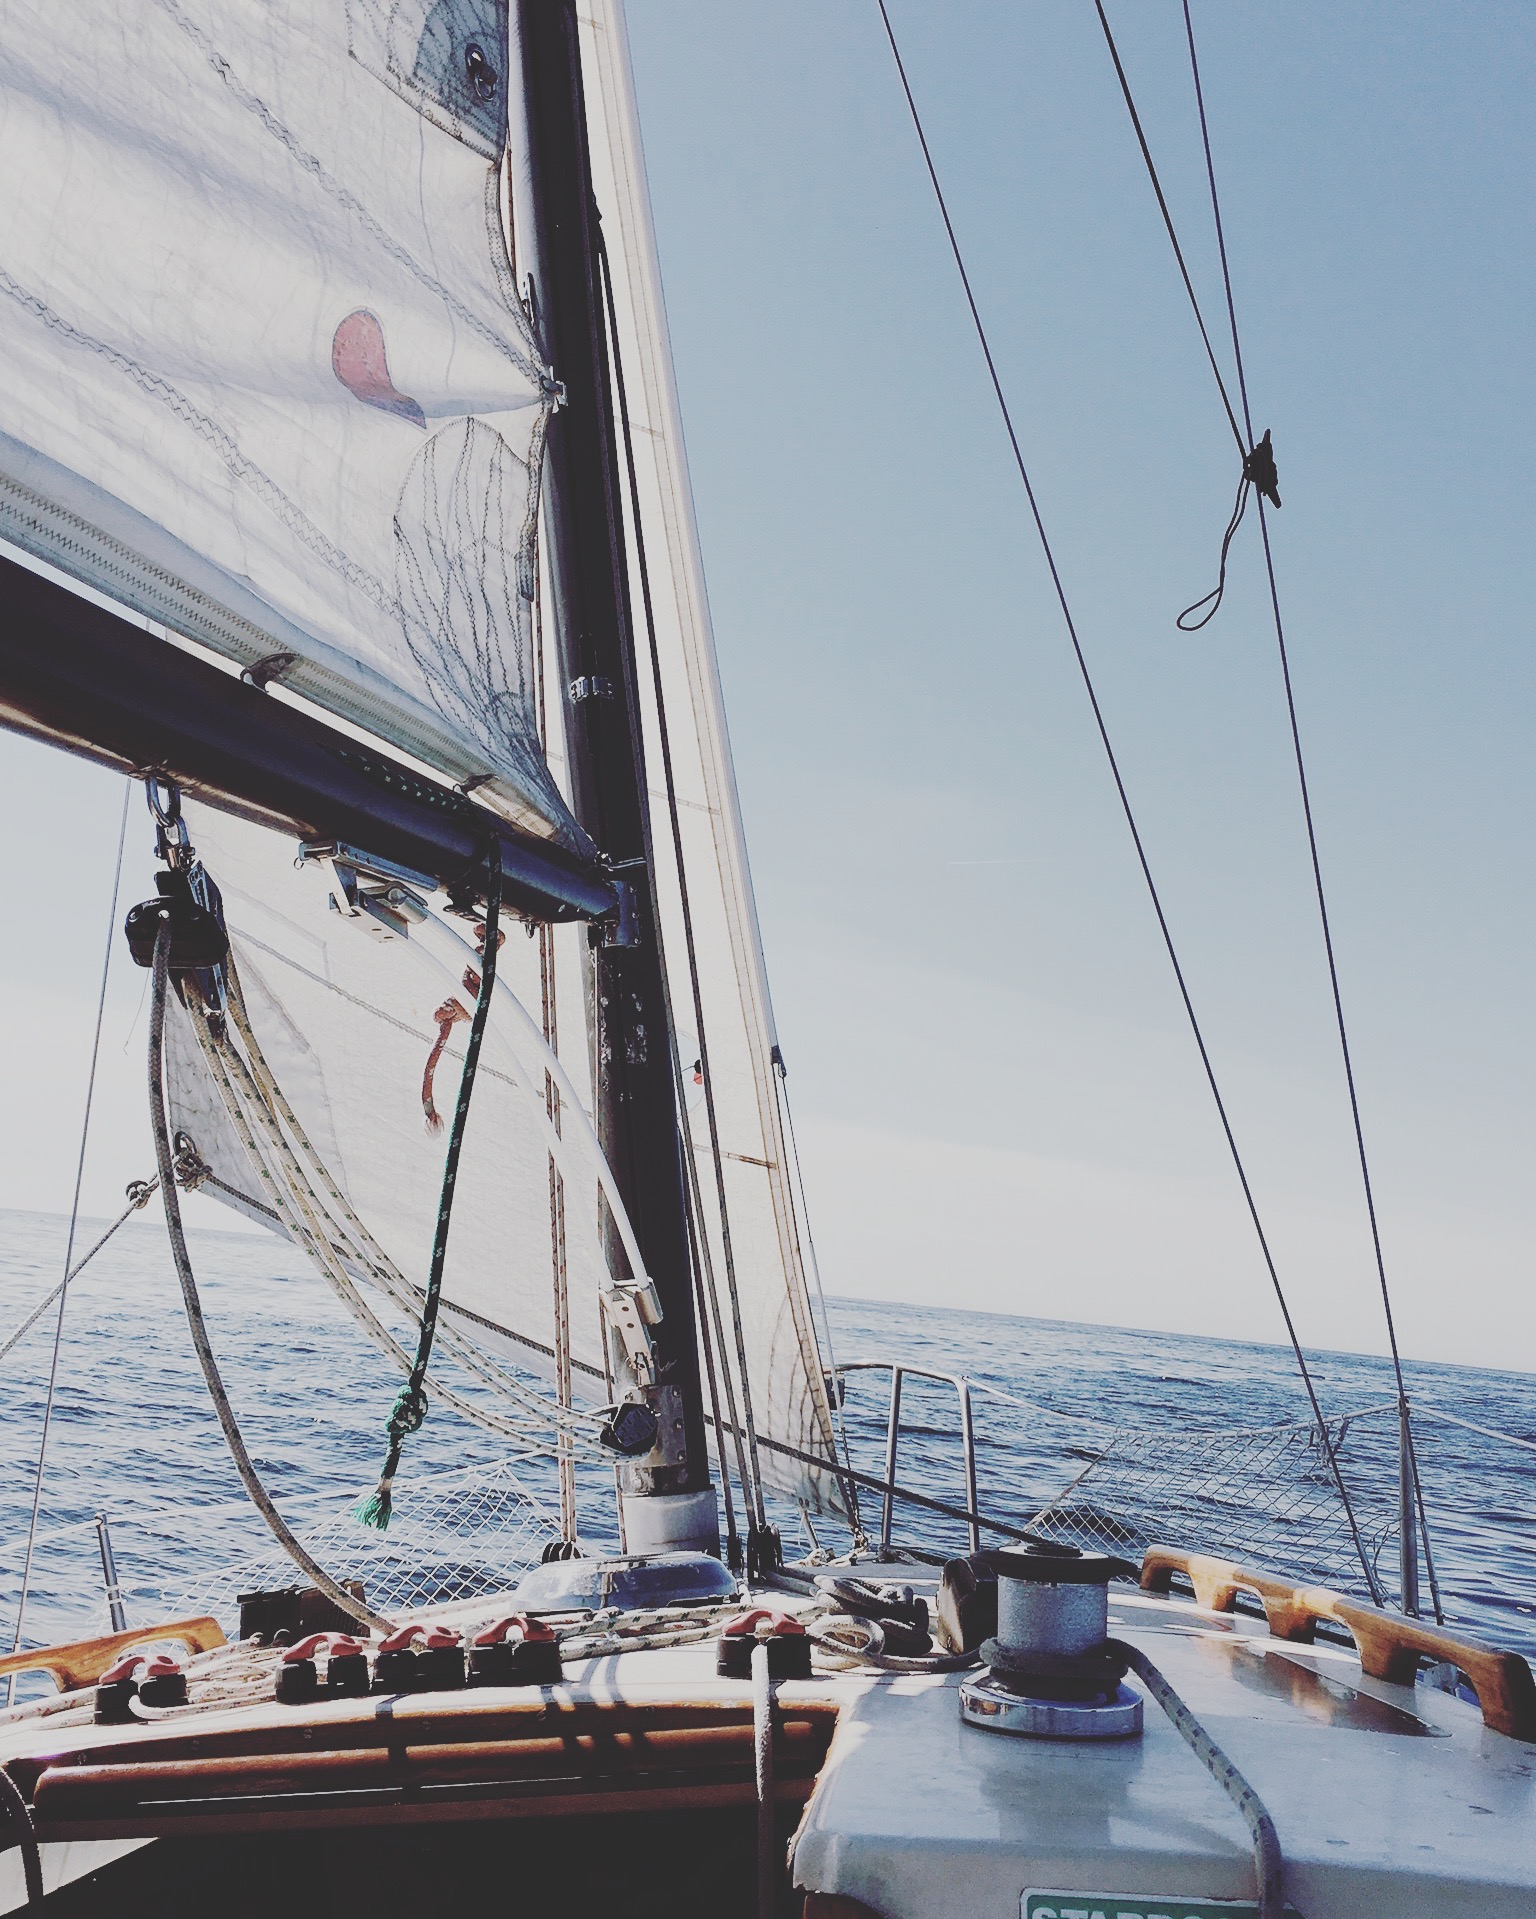 A shot from sailing around Santa Cruz in 2016